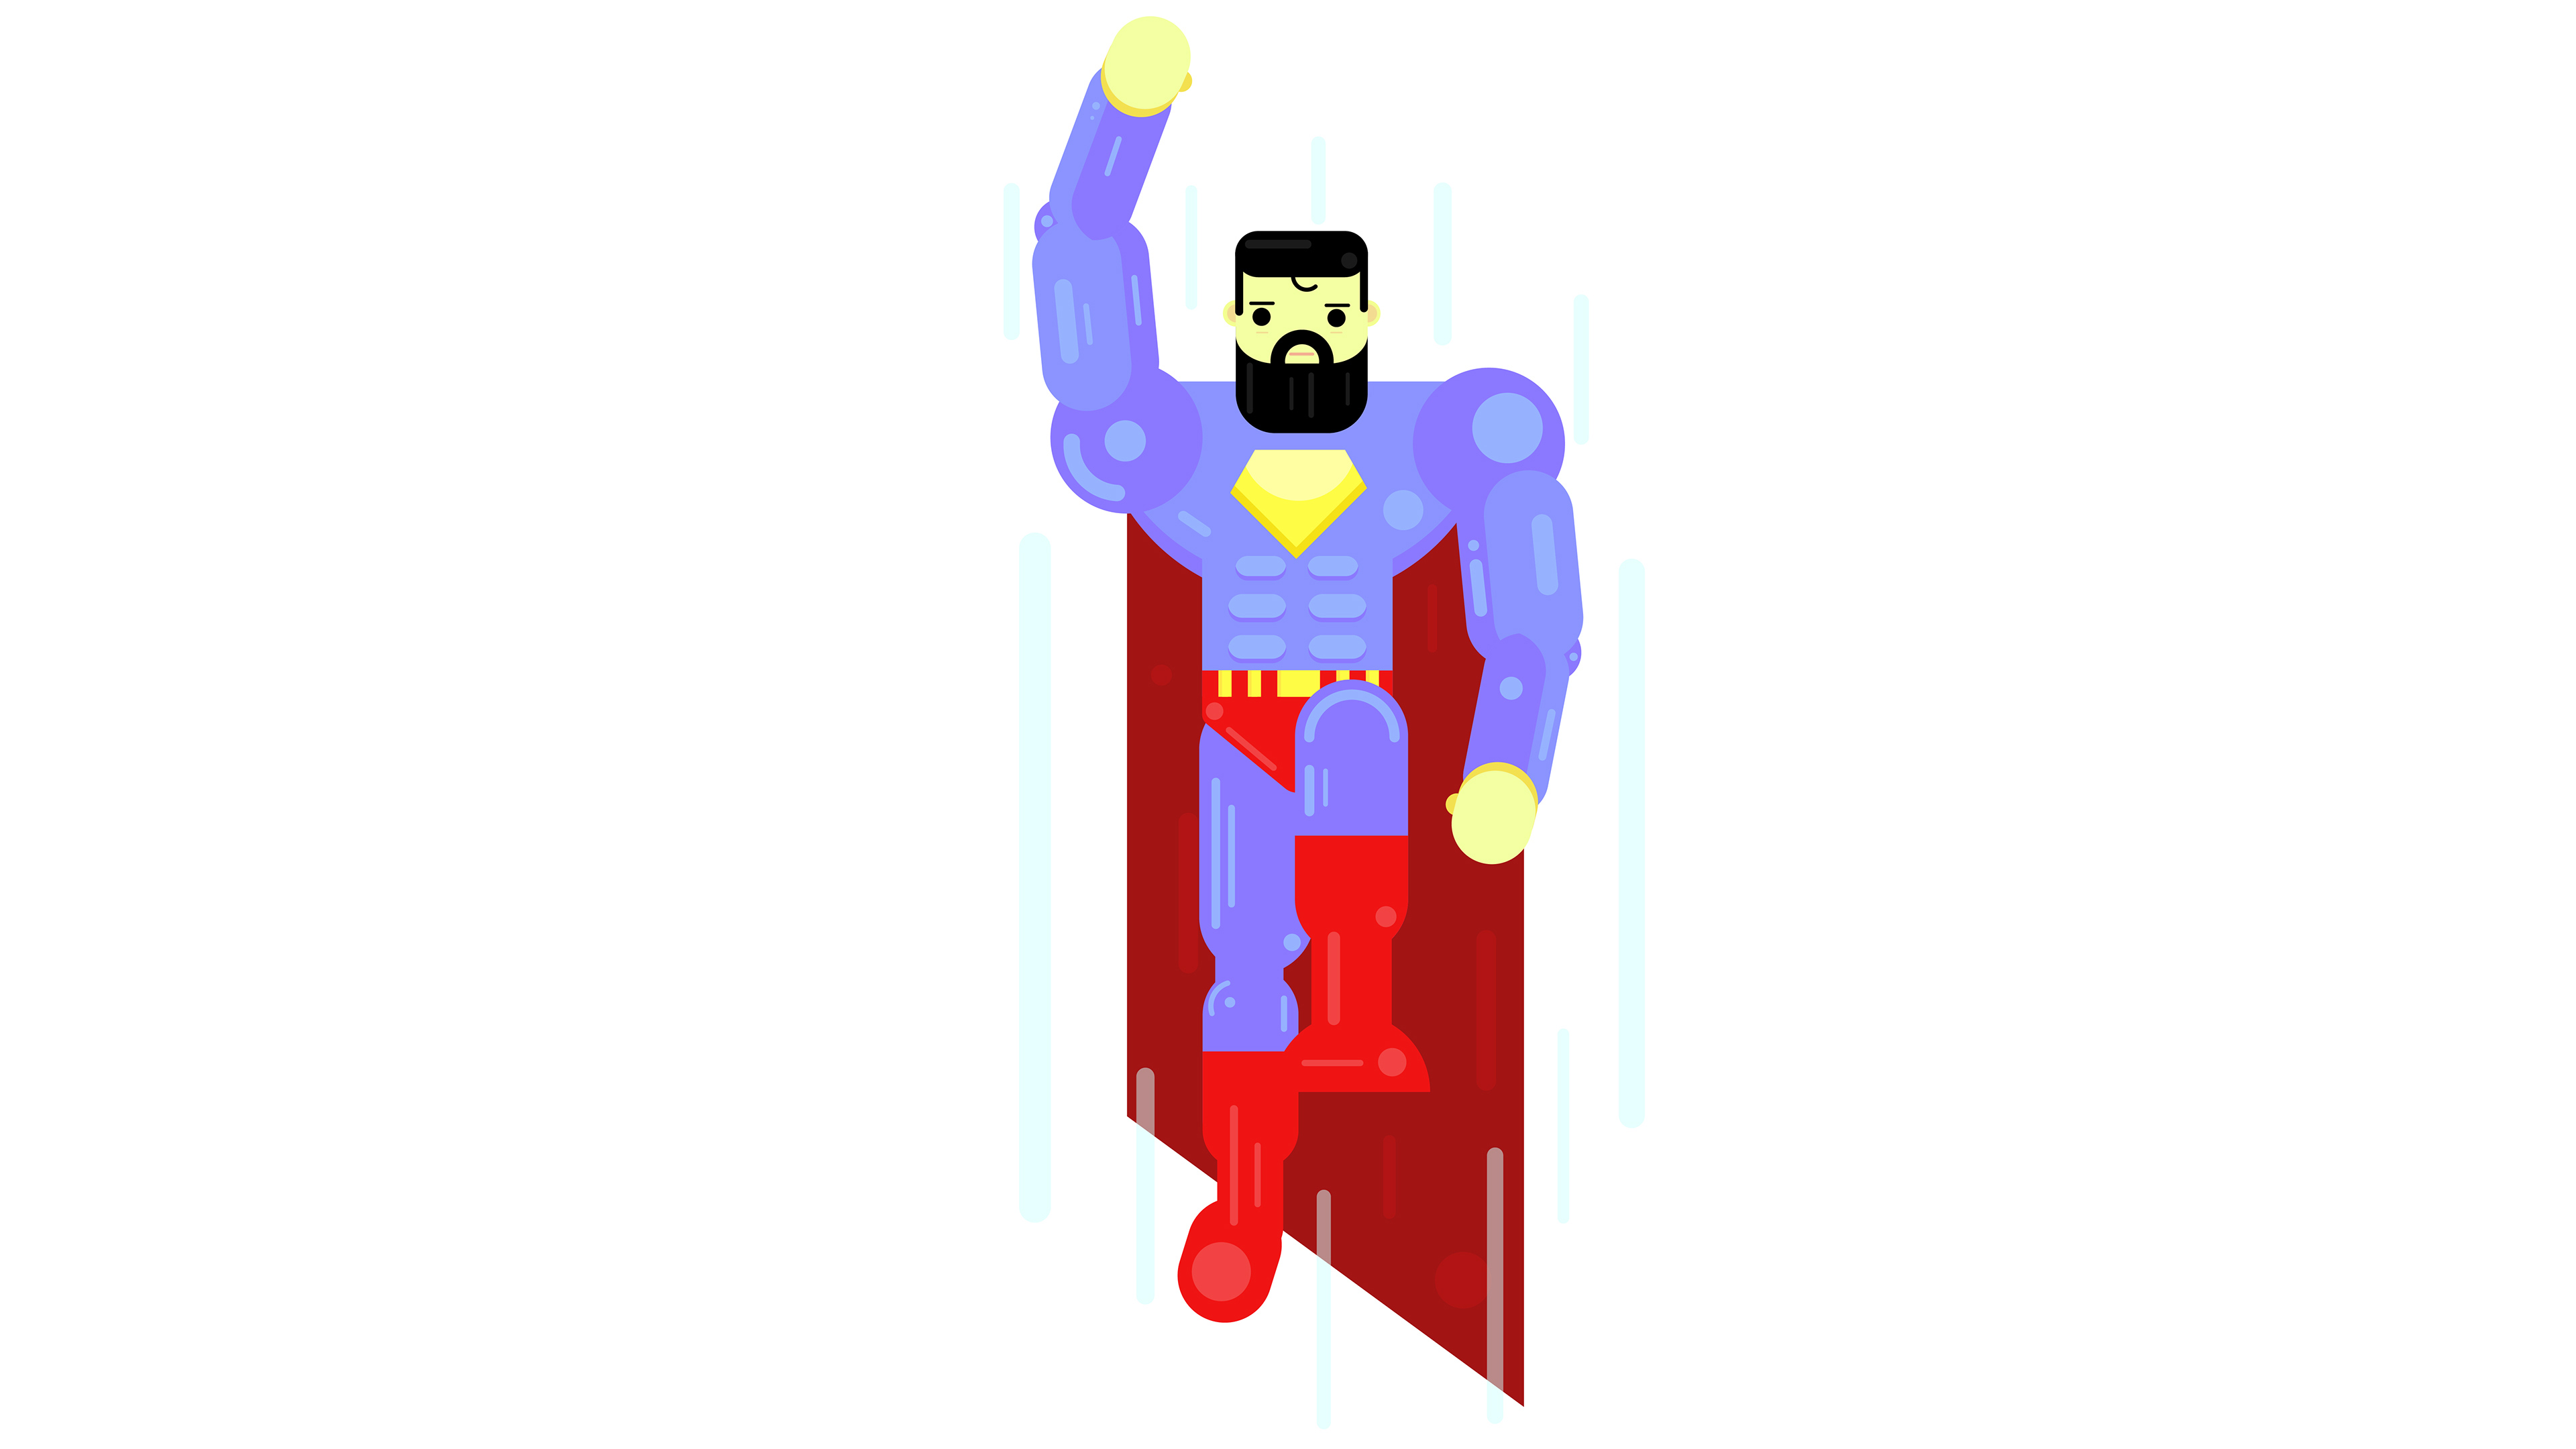 arab superman 4k 1557260290 - Arab Superman 4k - superman wallpapers, superheroes wallpapers, hd-wallpapers, behance wallpapers, 4k-wallpapers